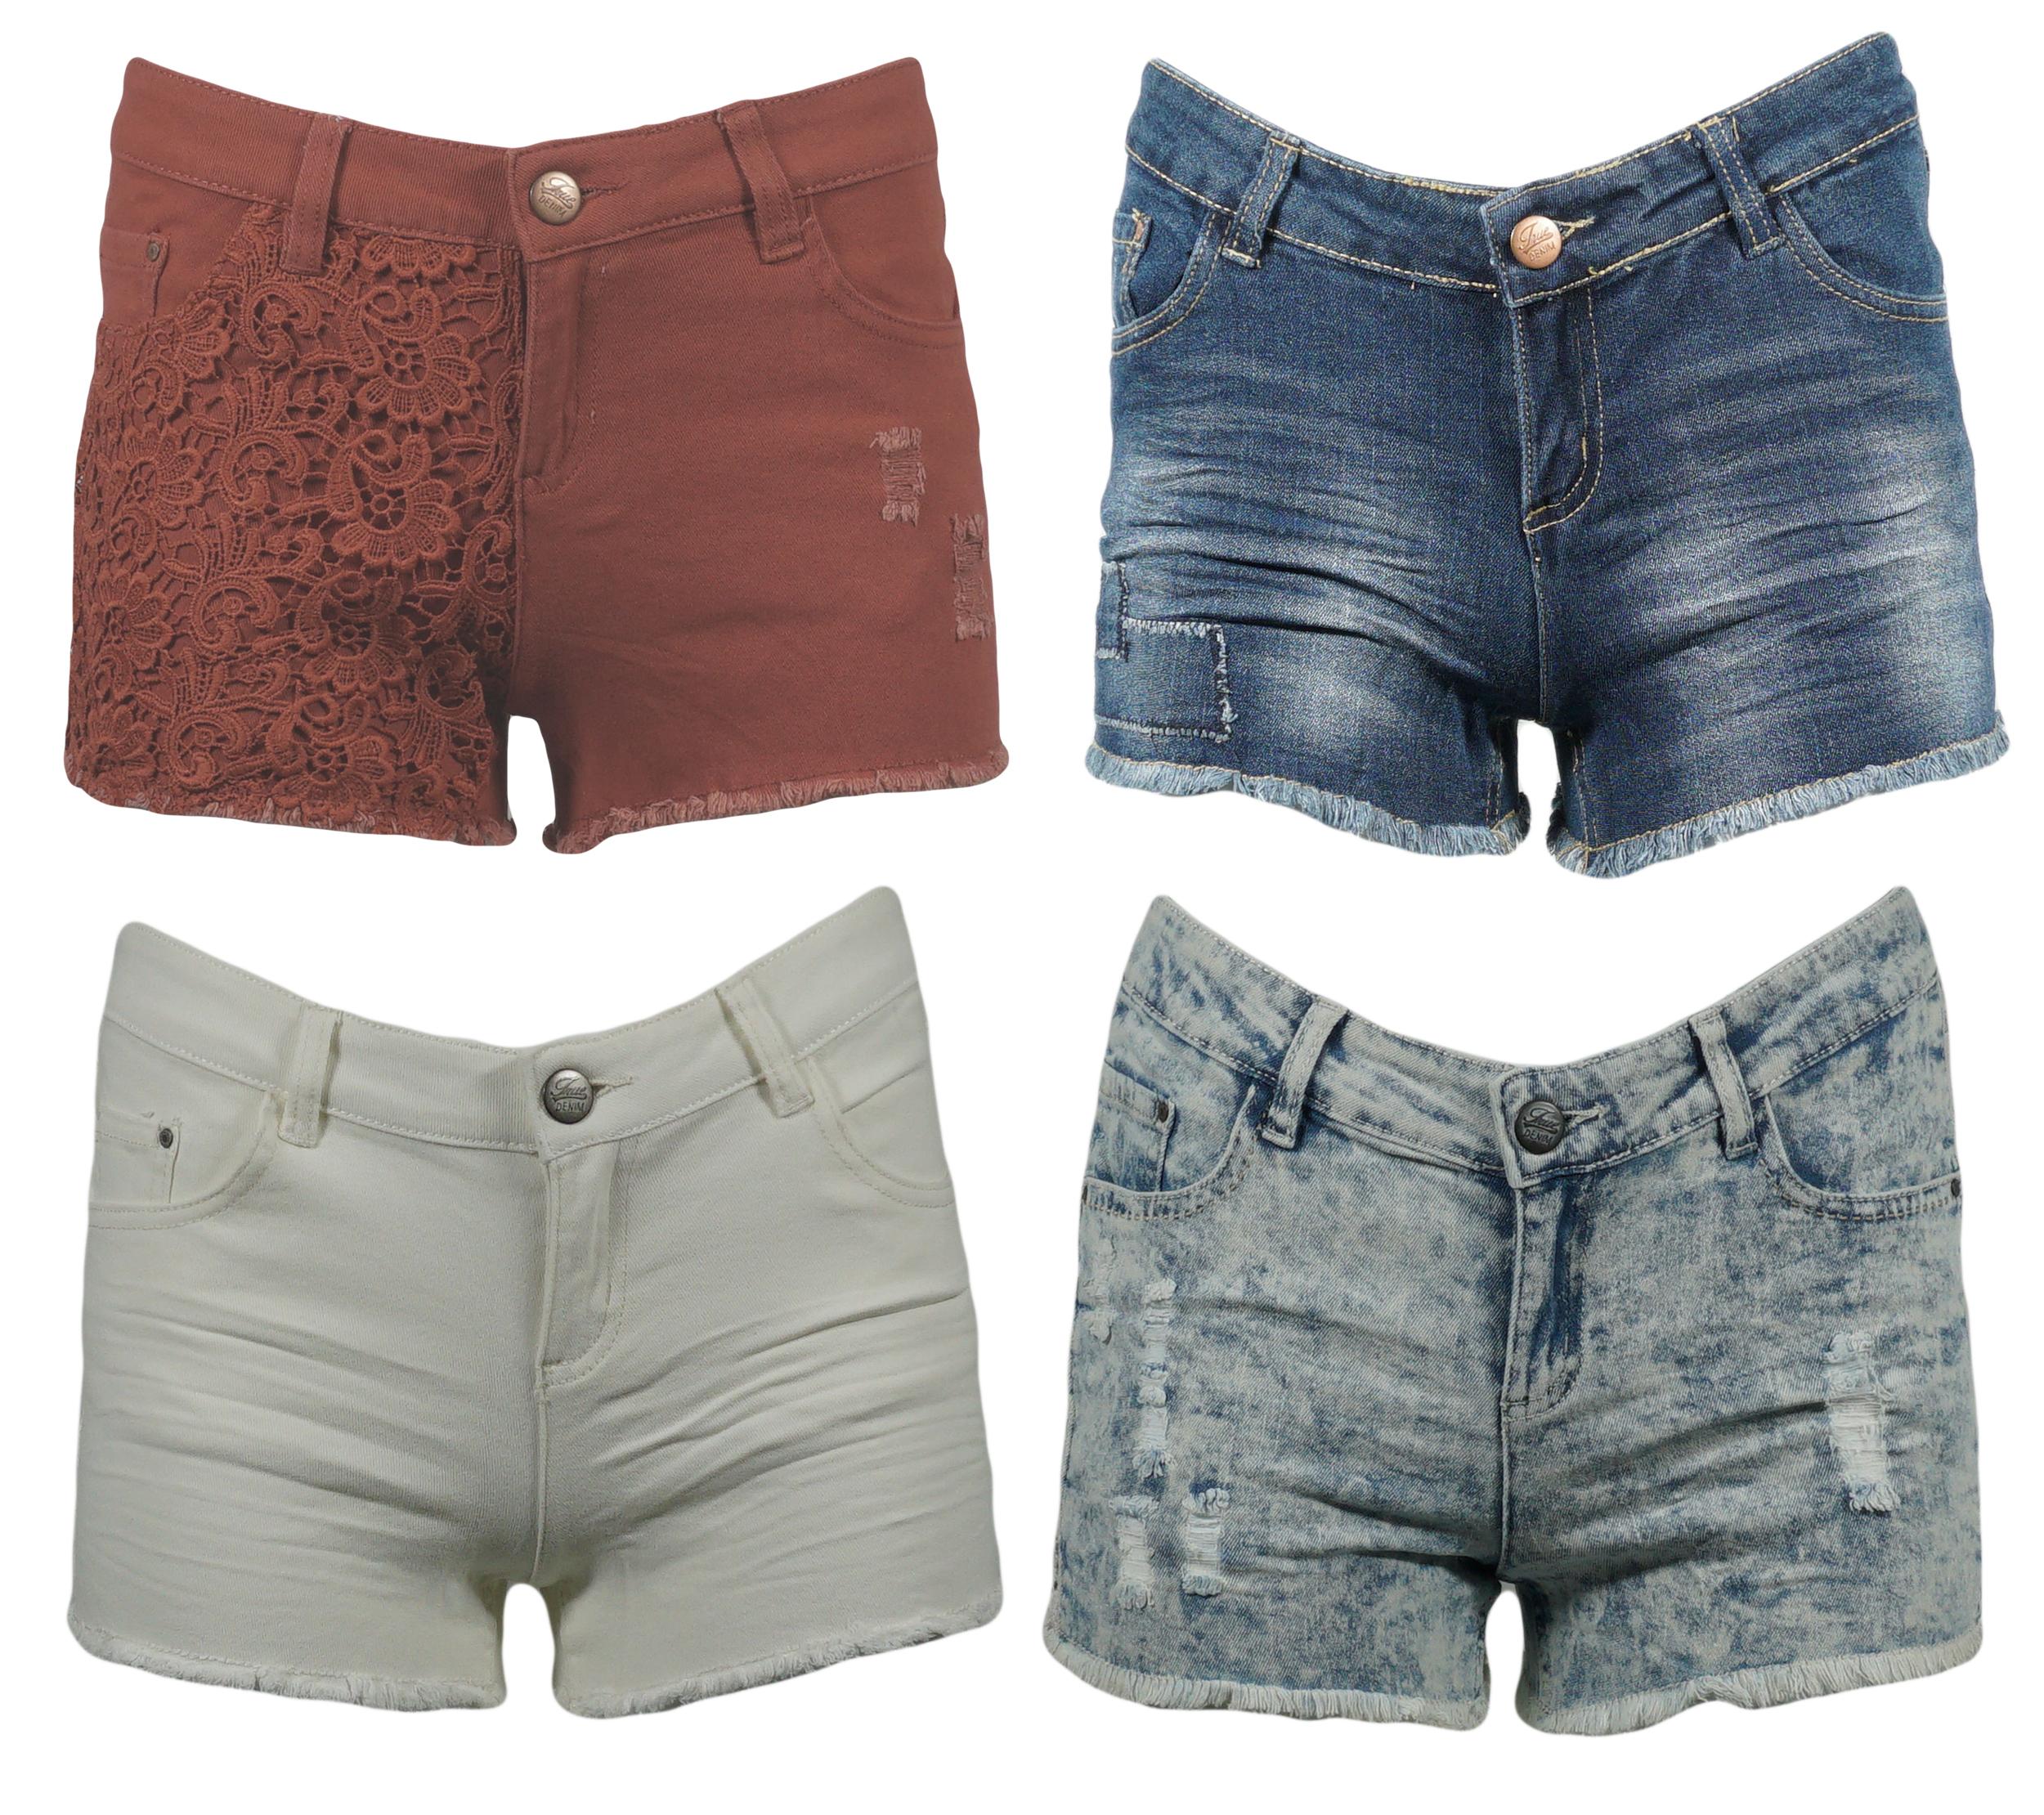 R 21 Damen Hot Pants Sommer kurze Hose Shorts